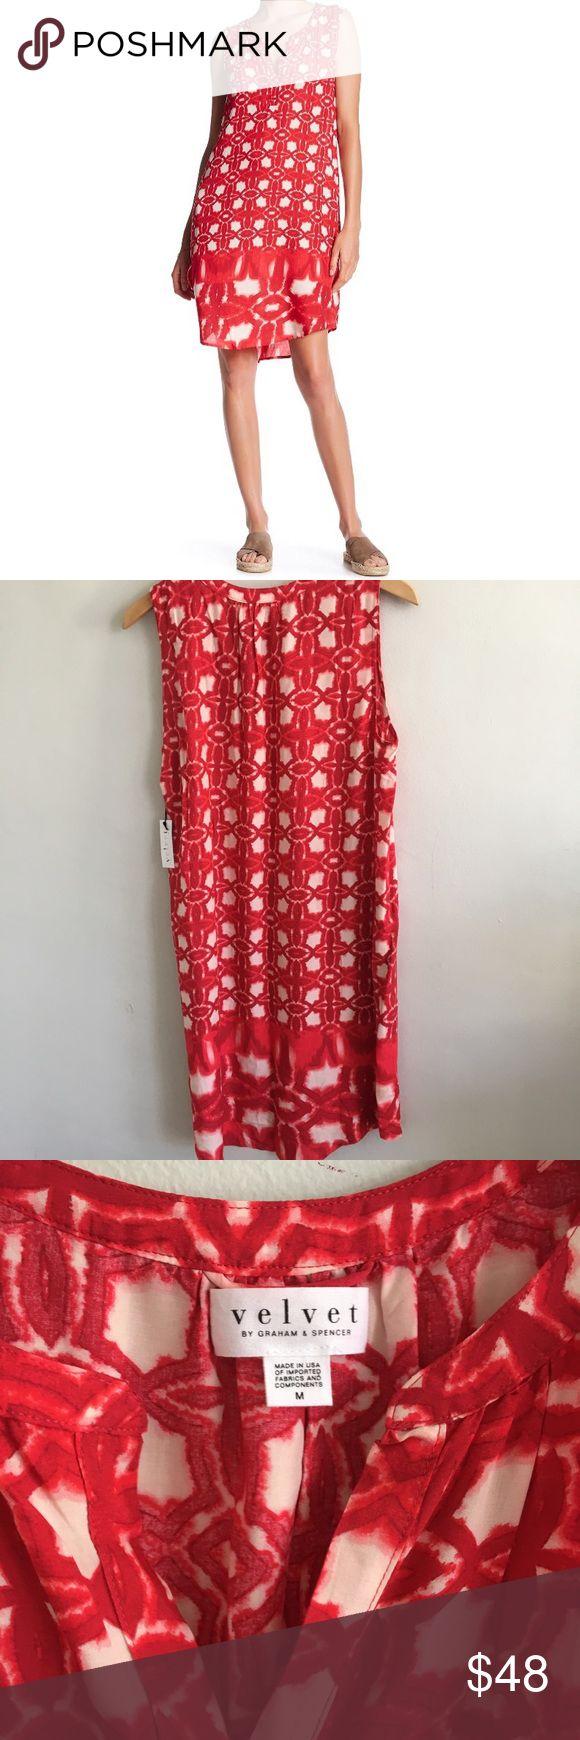 "Velvet by Graham & Spencer Red Bonita Shift Dress Velvet by Graham & Spencer Bonita Dress Sz M Red White Floral Shift Resort. Brand new with tags. 100% viscose. Chest: 40"". Length: 39"". Velvet by Graham & Spencer Dresses Mini"